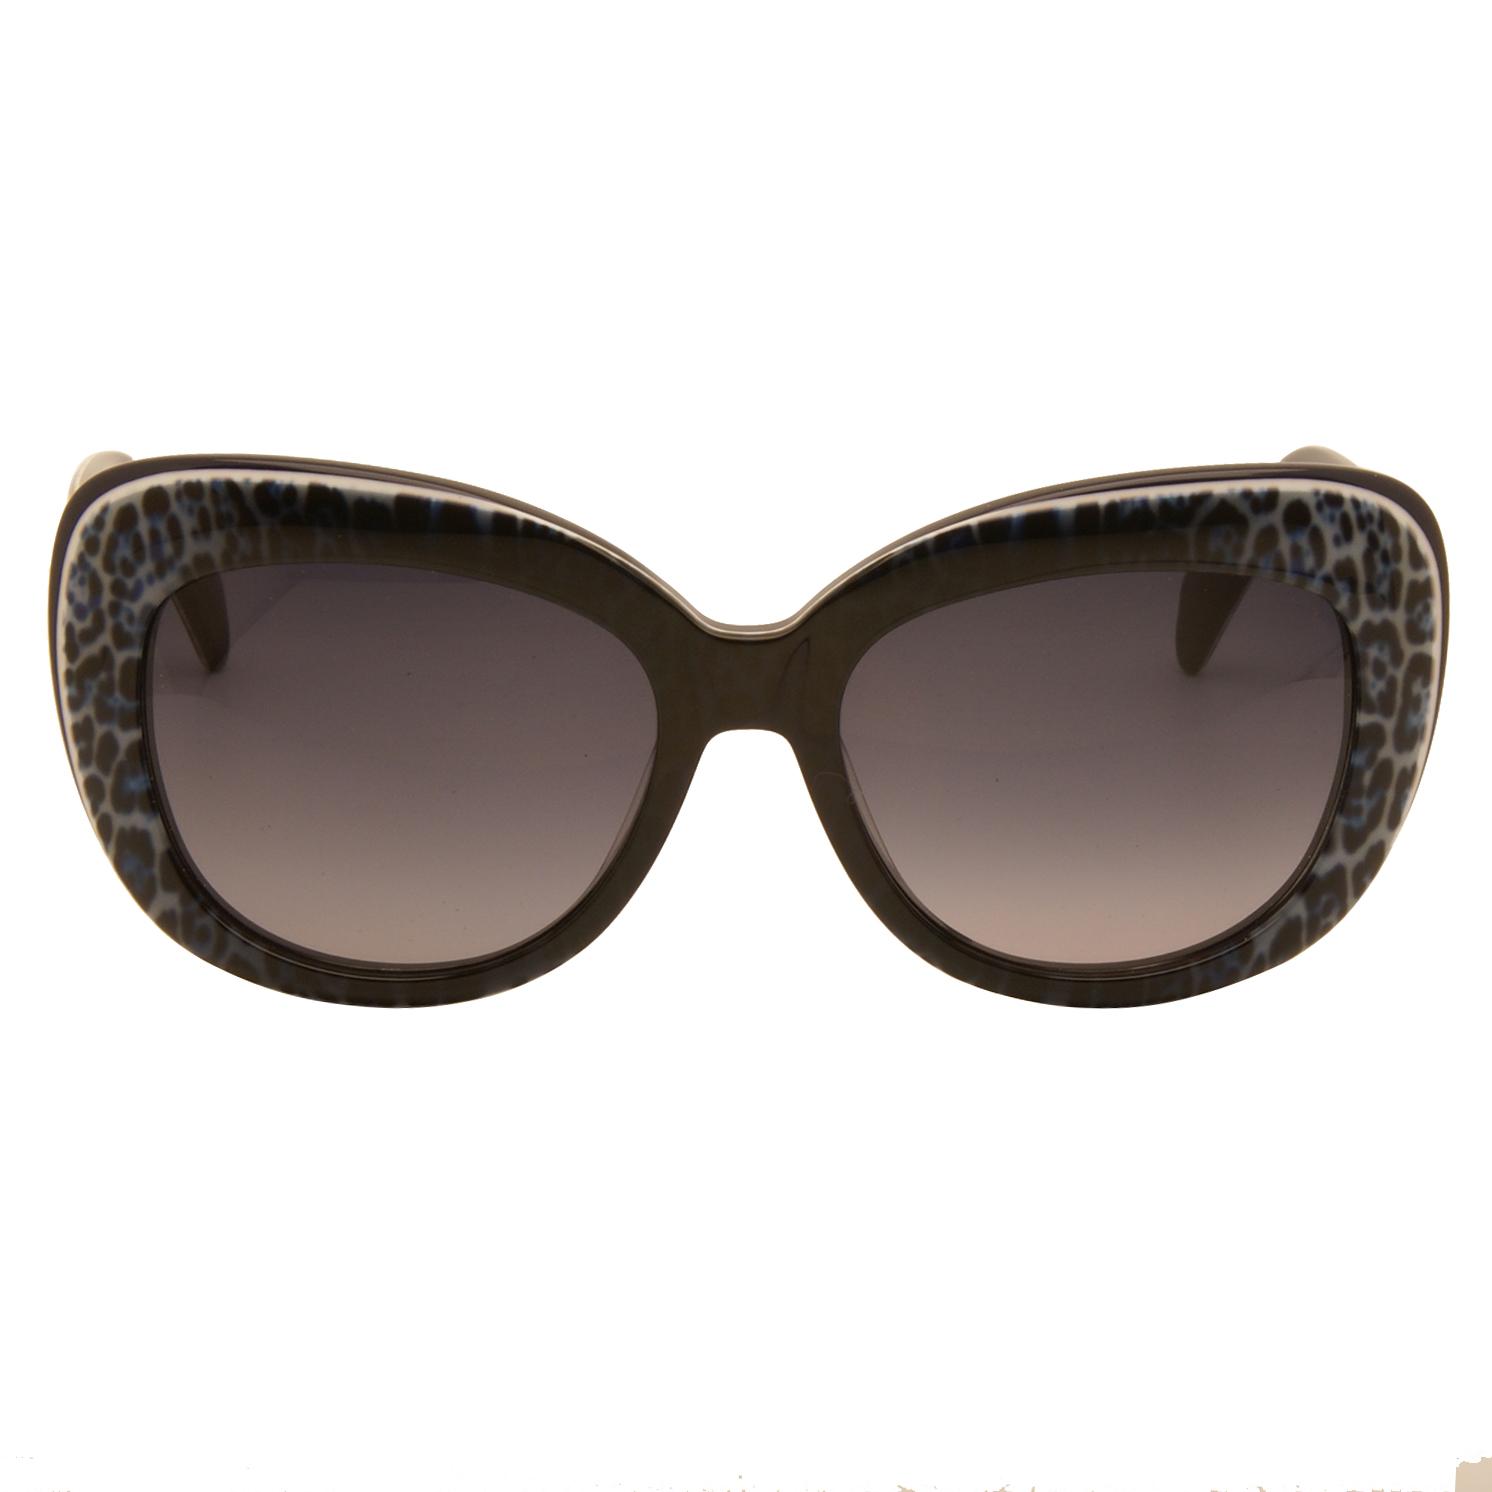 Just Cavalli – Blue Animal Print Cat Eye Style Sunglasses with Case